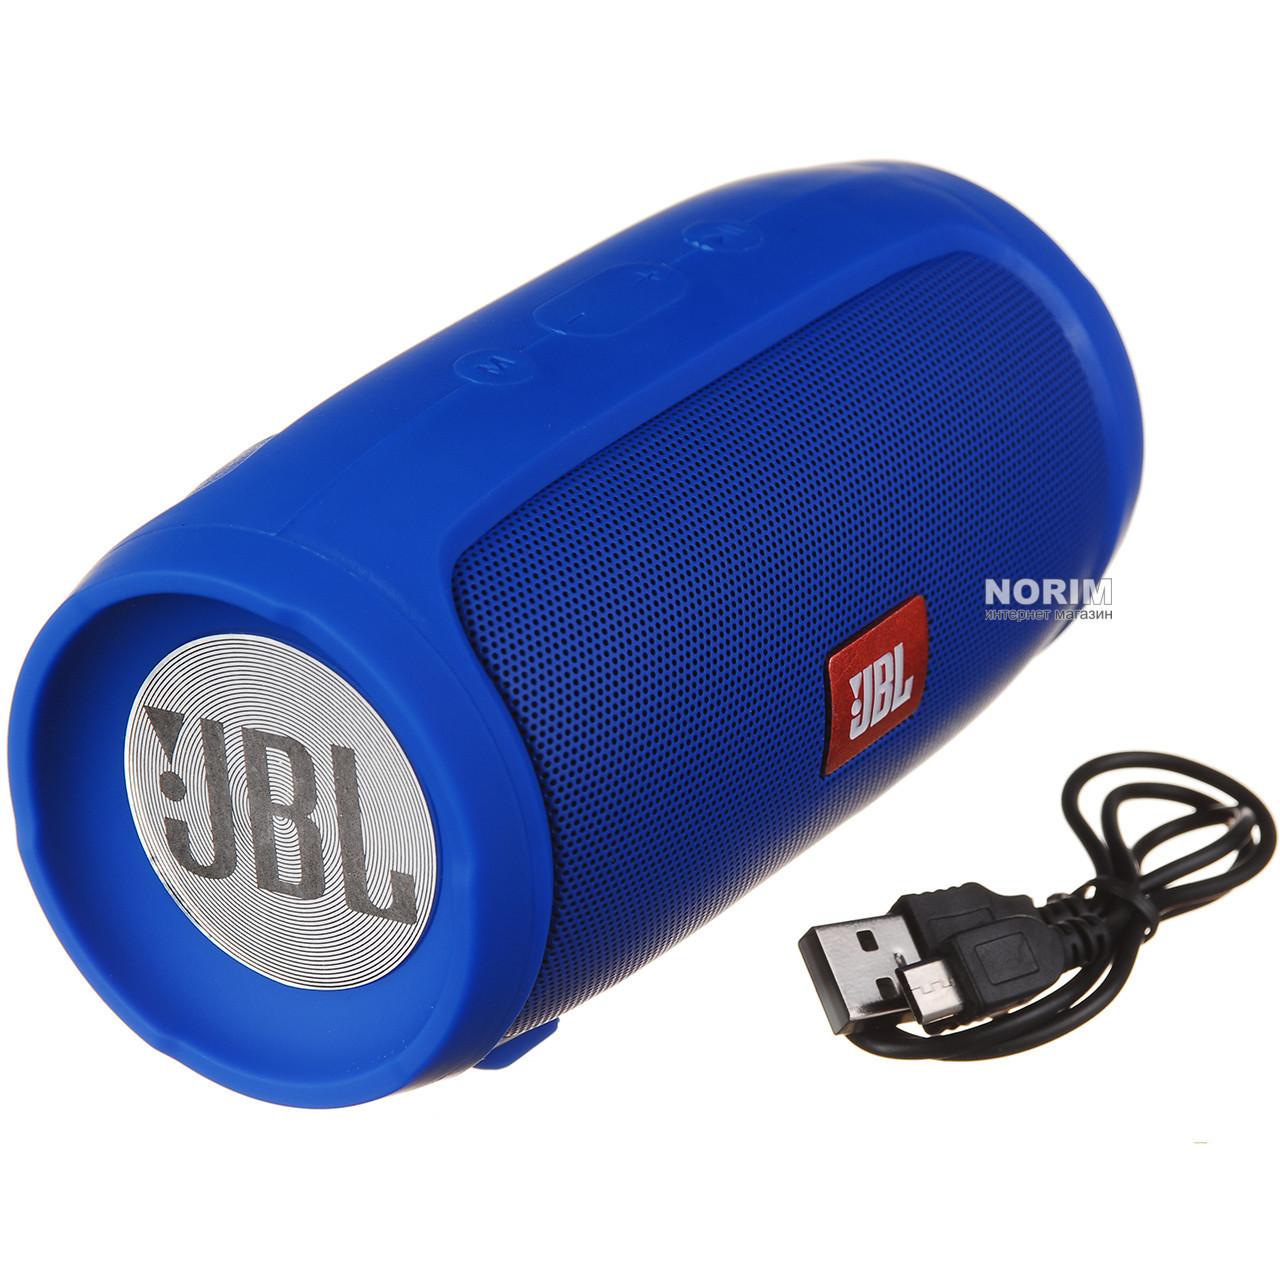 Портативна Bluetooth блютуз колонка JBL Charge 3 MINI колонка з USB,SD,FM / Блютуз - СИНЯ